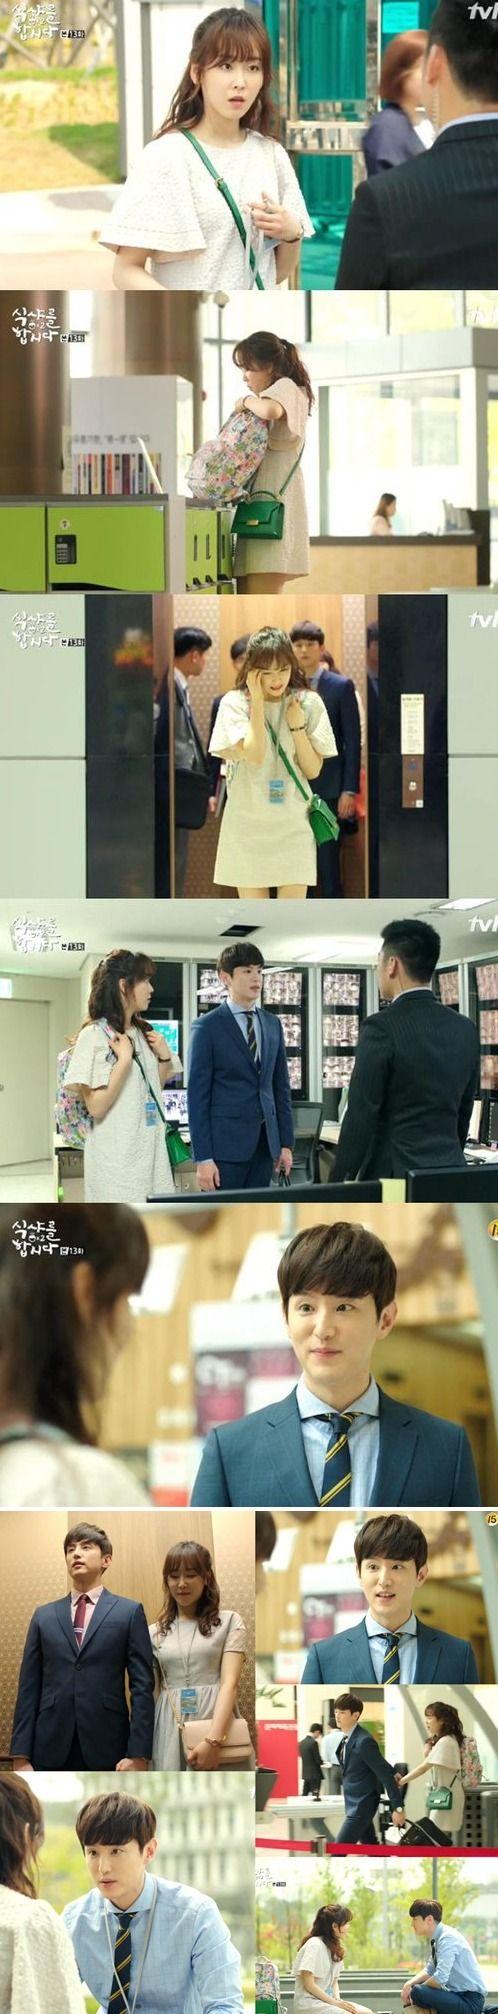 [Spoiler] Added episode 13 captures for the Korean drama 'Let's Eat - Season 2' @ HanCinema :: The Korean Movie and Drama Database